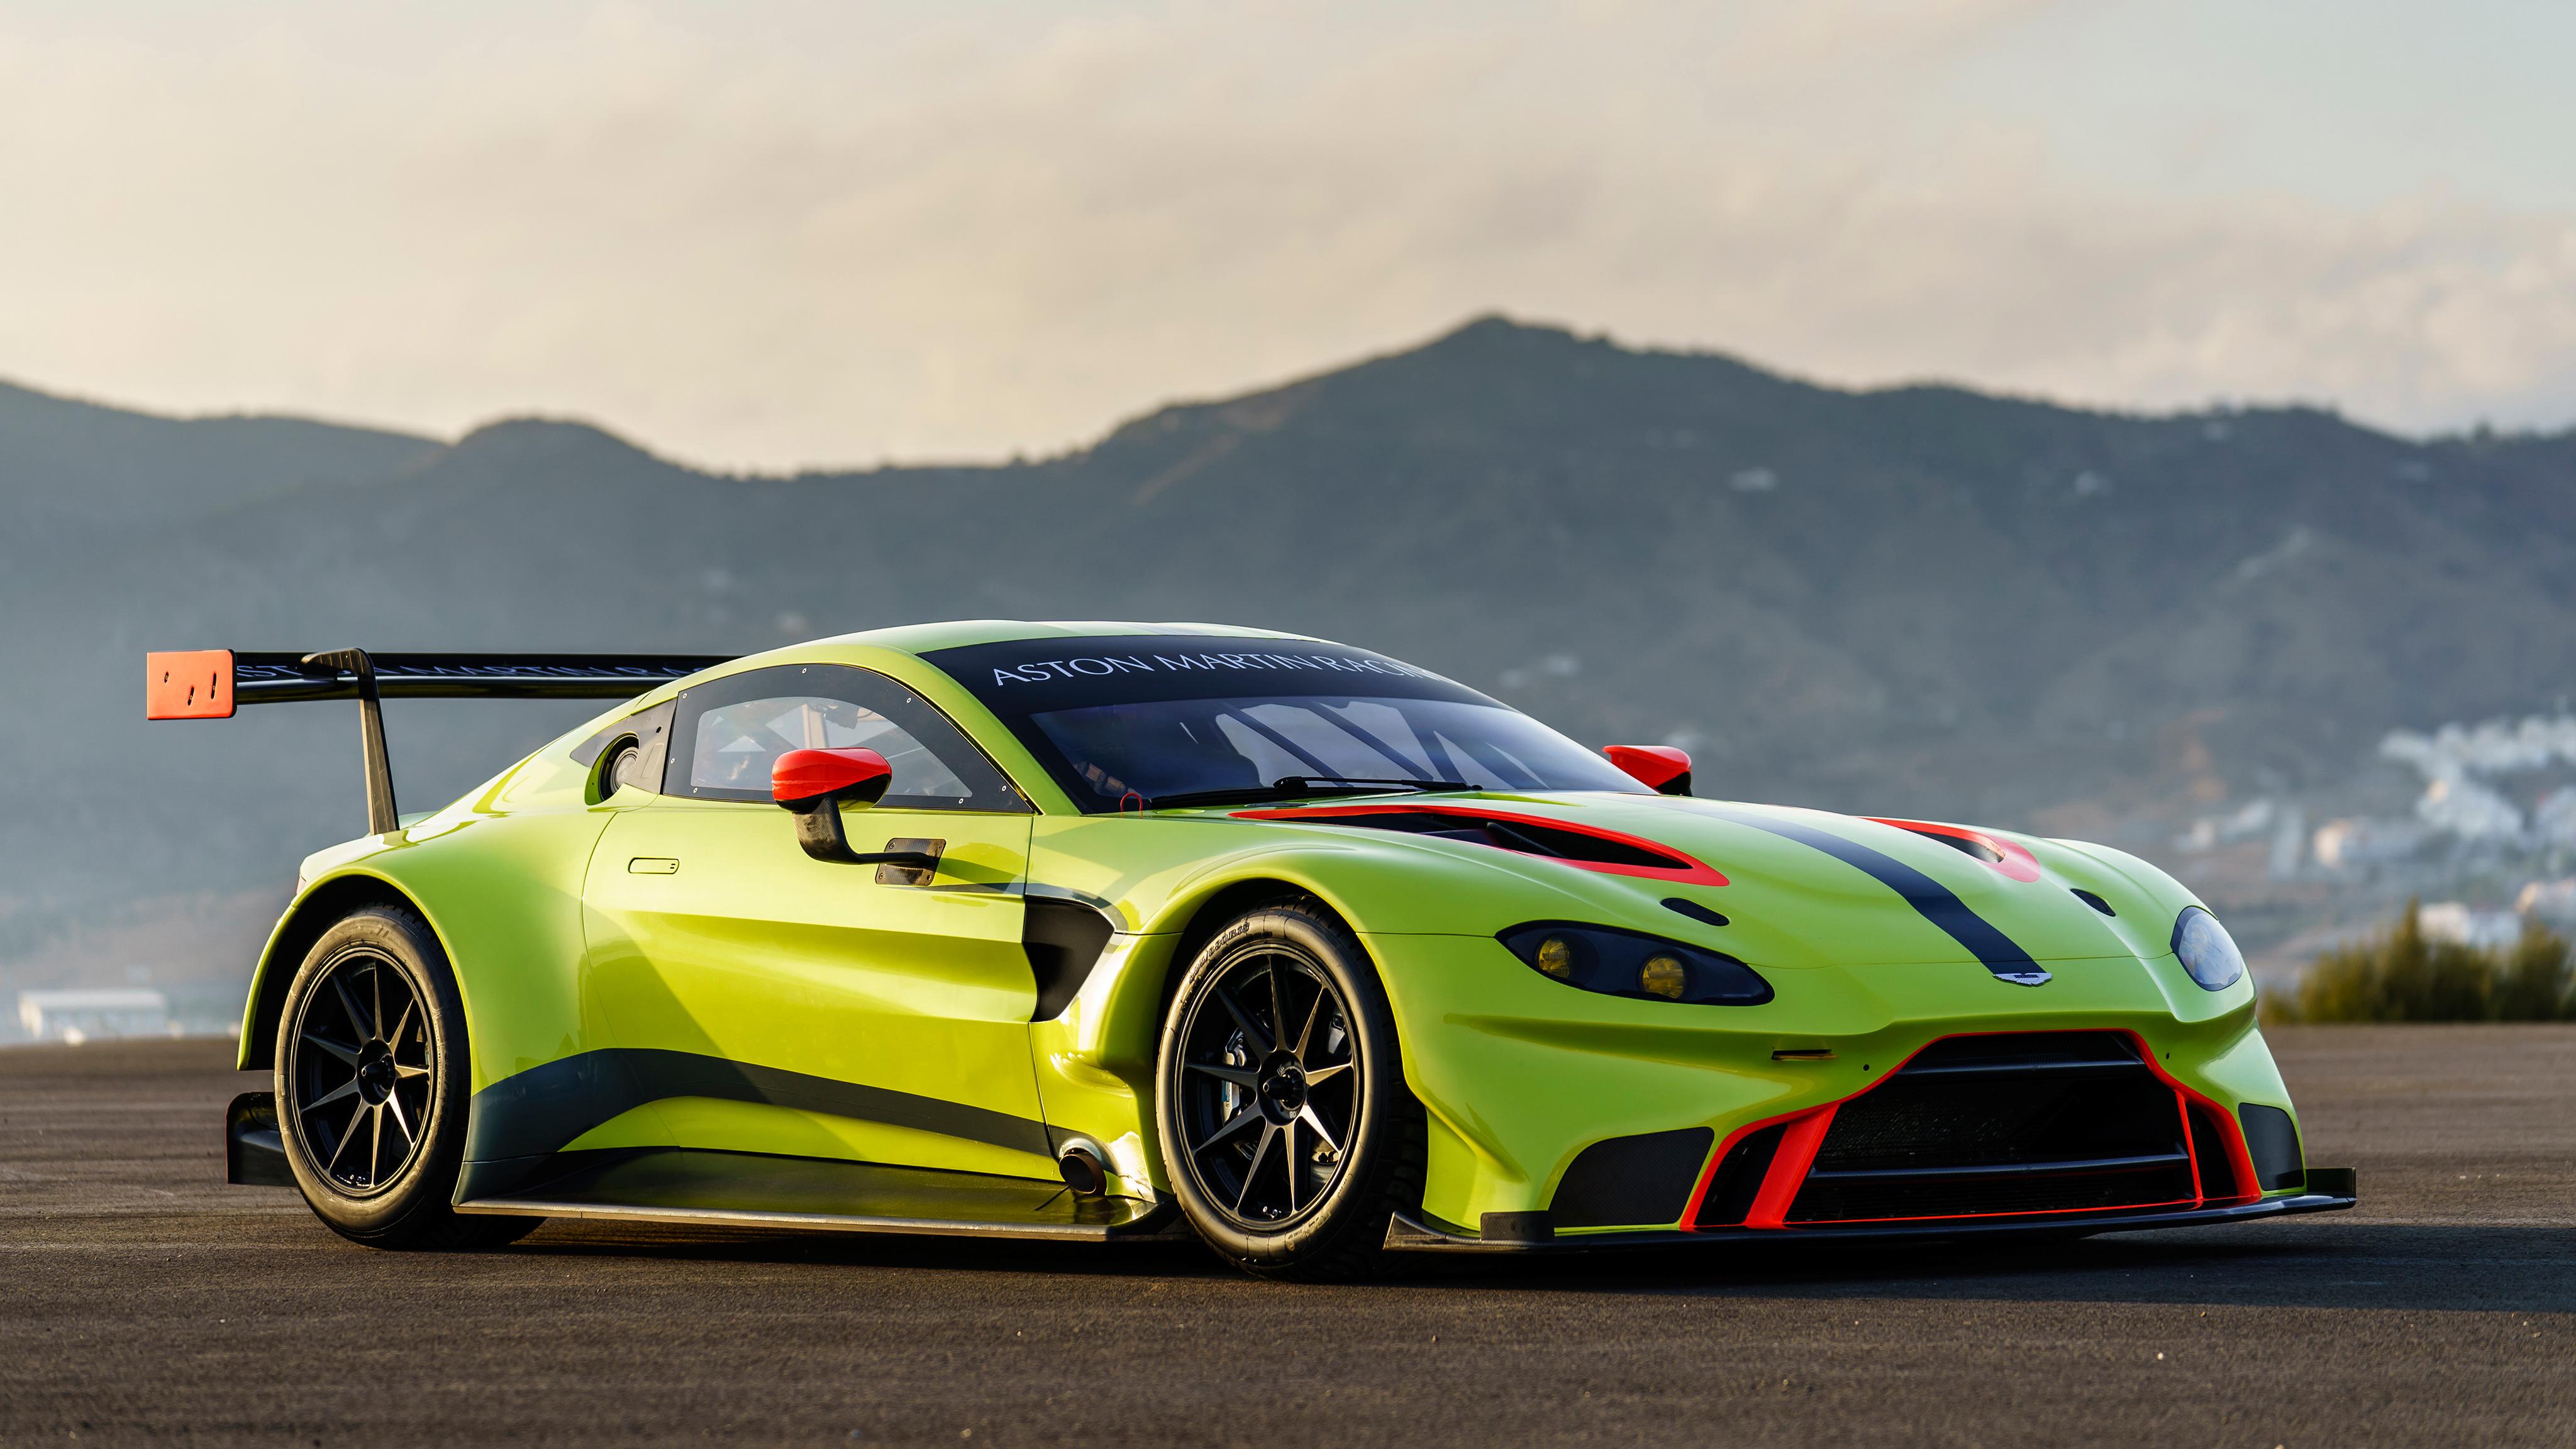 2018 Aston Martin Vantage GTE 4K 4 Wallpaper HD Car Wallpapers 4096x2304